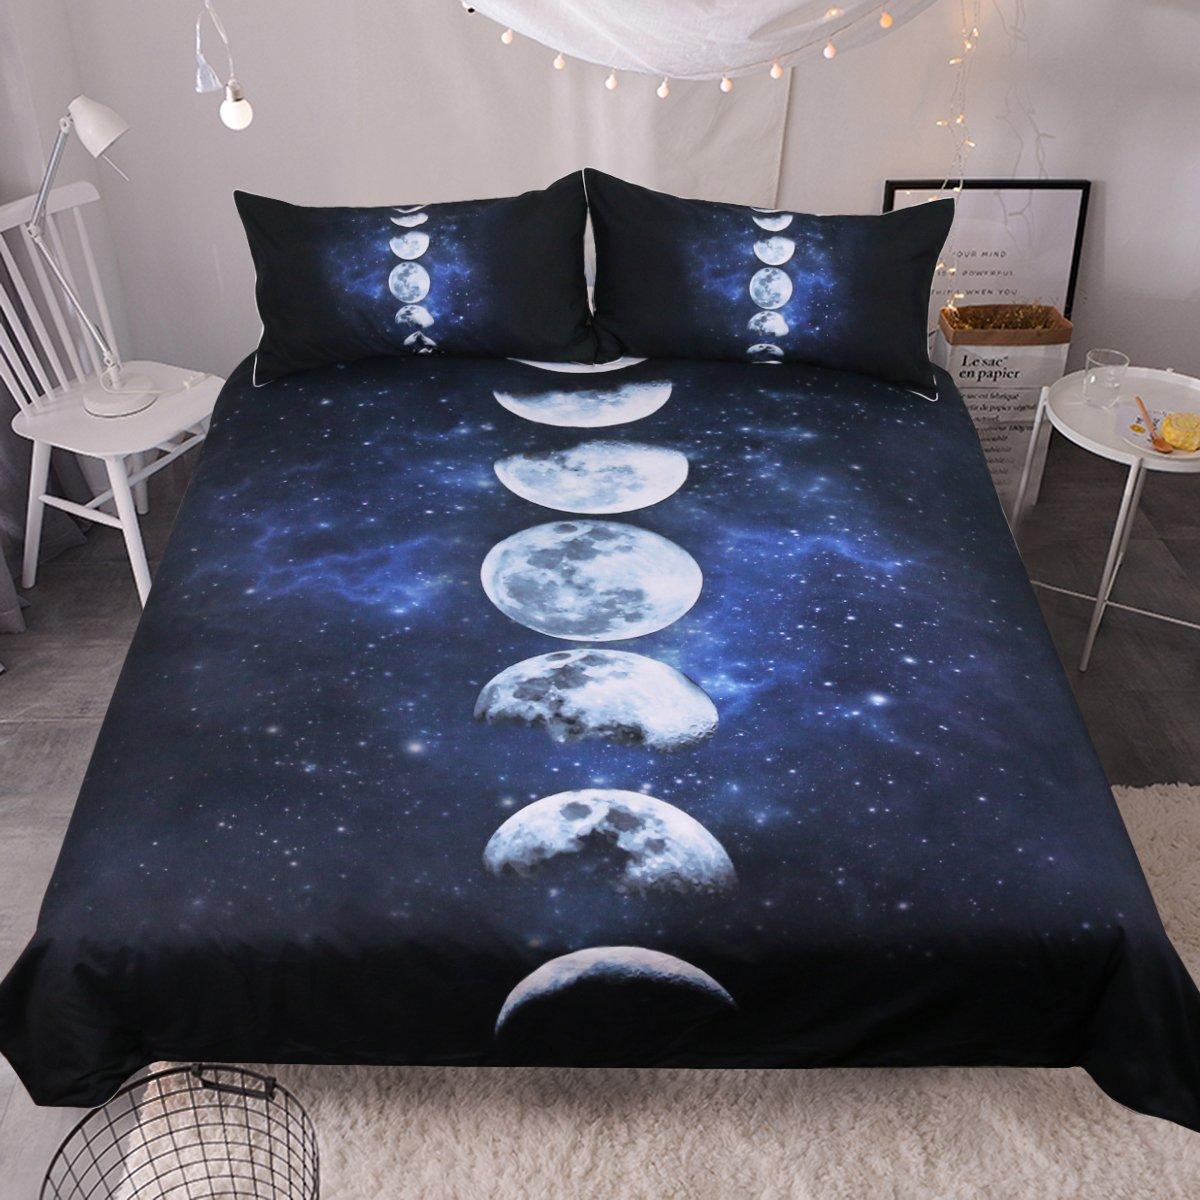 queen or celestial cover set full bedding comforter pin twin duvet